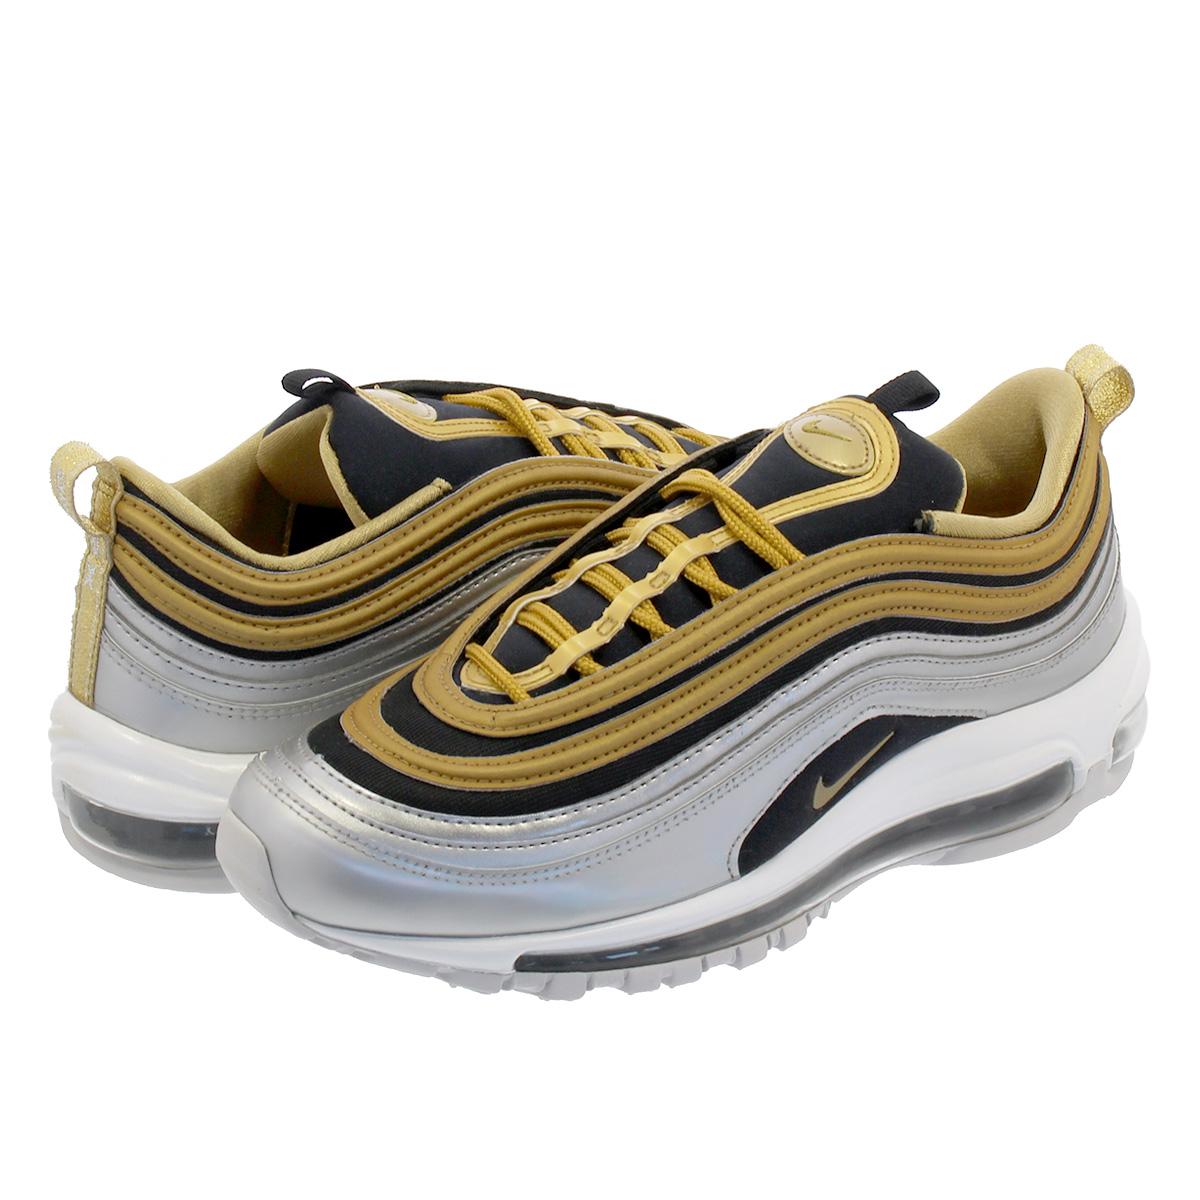 05ee1f46cb036c NIKE WMNS AIR MAX 97 SE Nike women Air Max 97 SE METALLIC SILVER METALLIC  GOLD aq4137-700